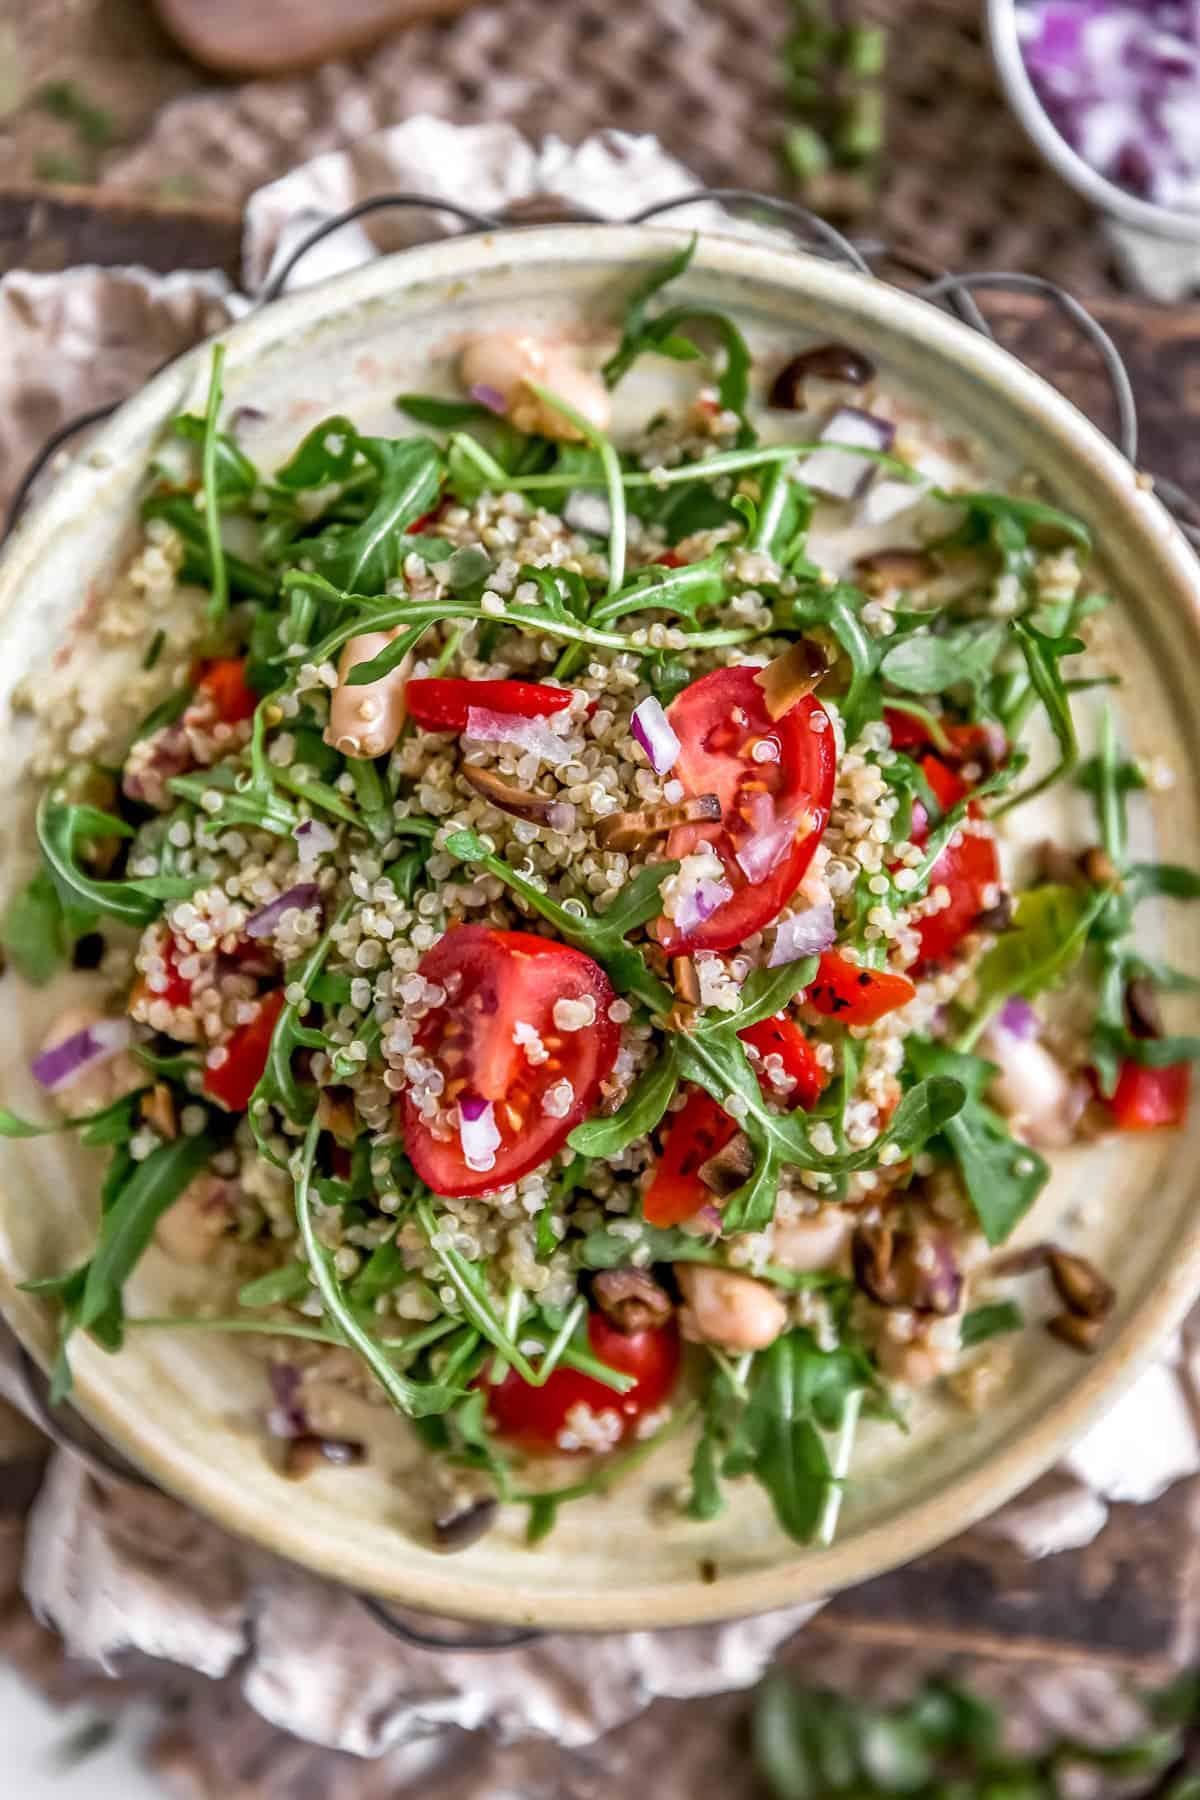 Plate of Mediterranean Quinoa Salad